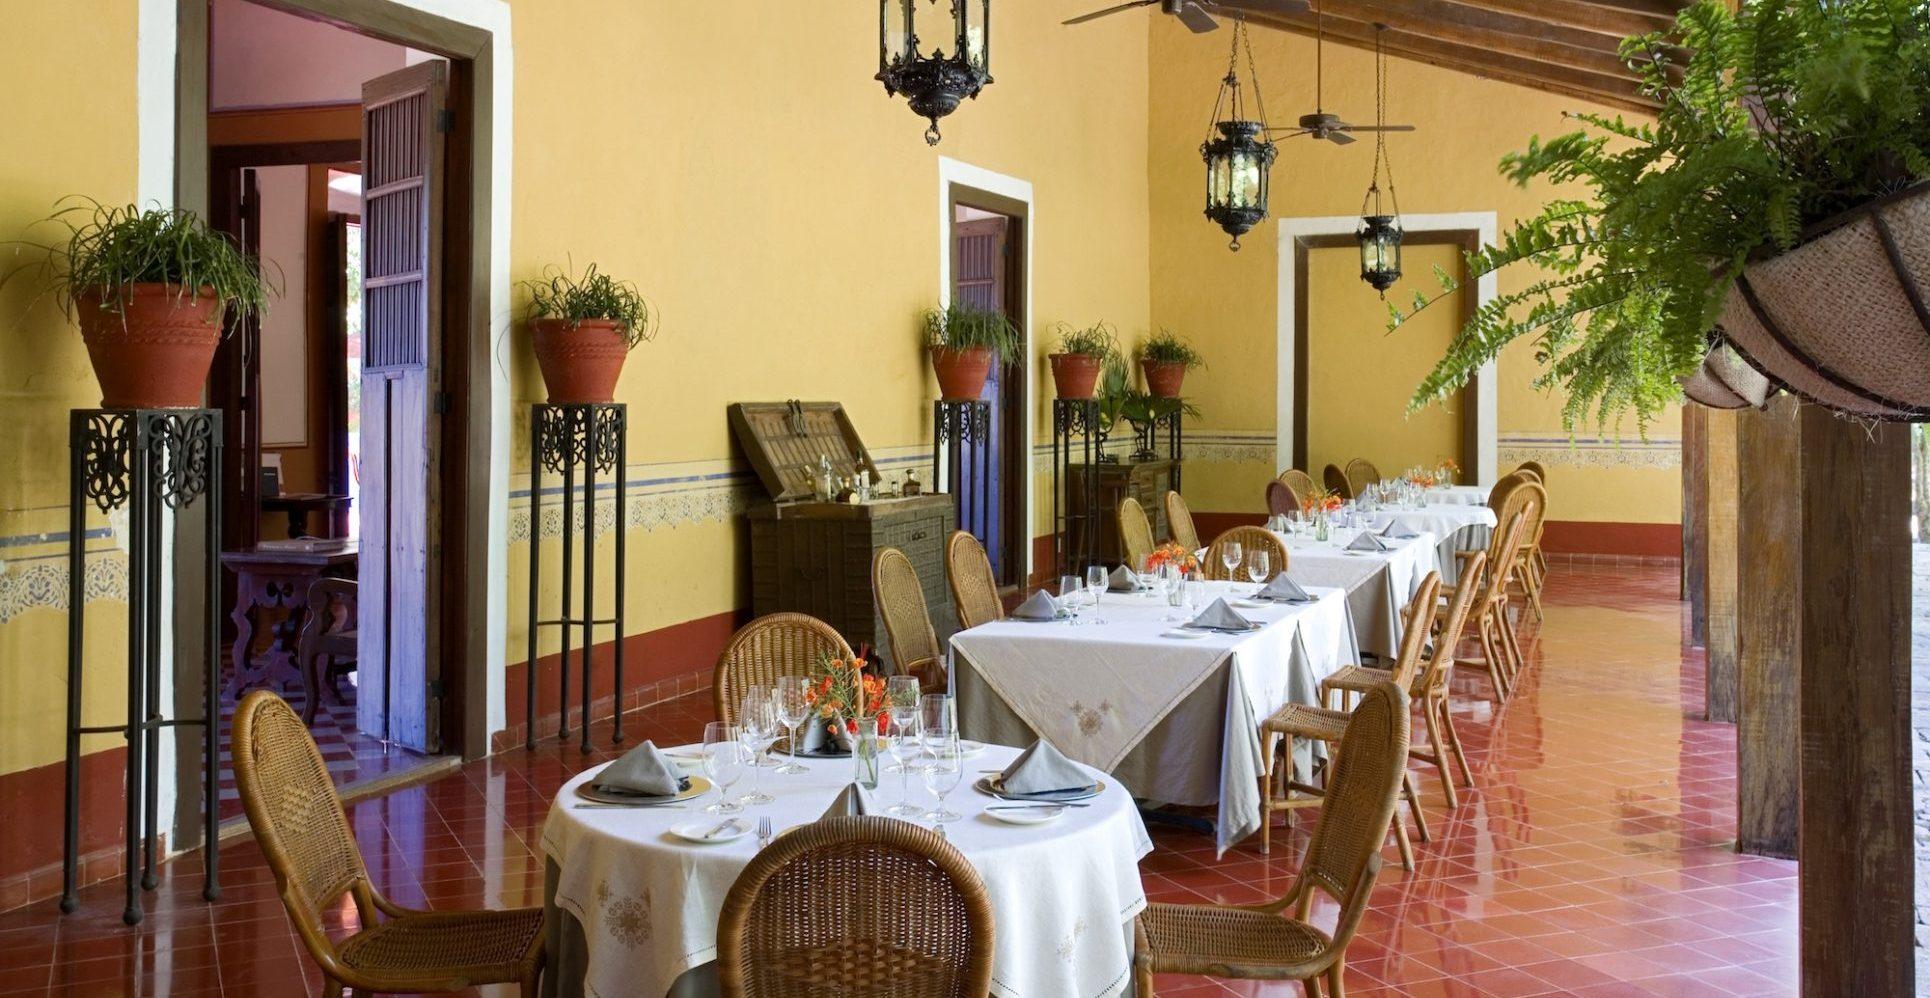 Mexiko, Hacienda Santa Rosa, Verandah mit gedeckten Tischen, Latin America Tours, Reisen